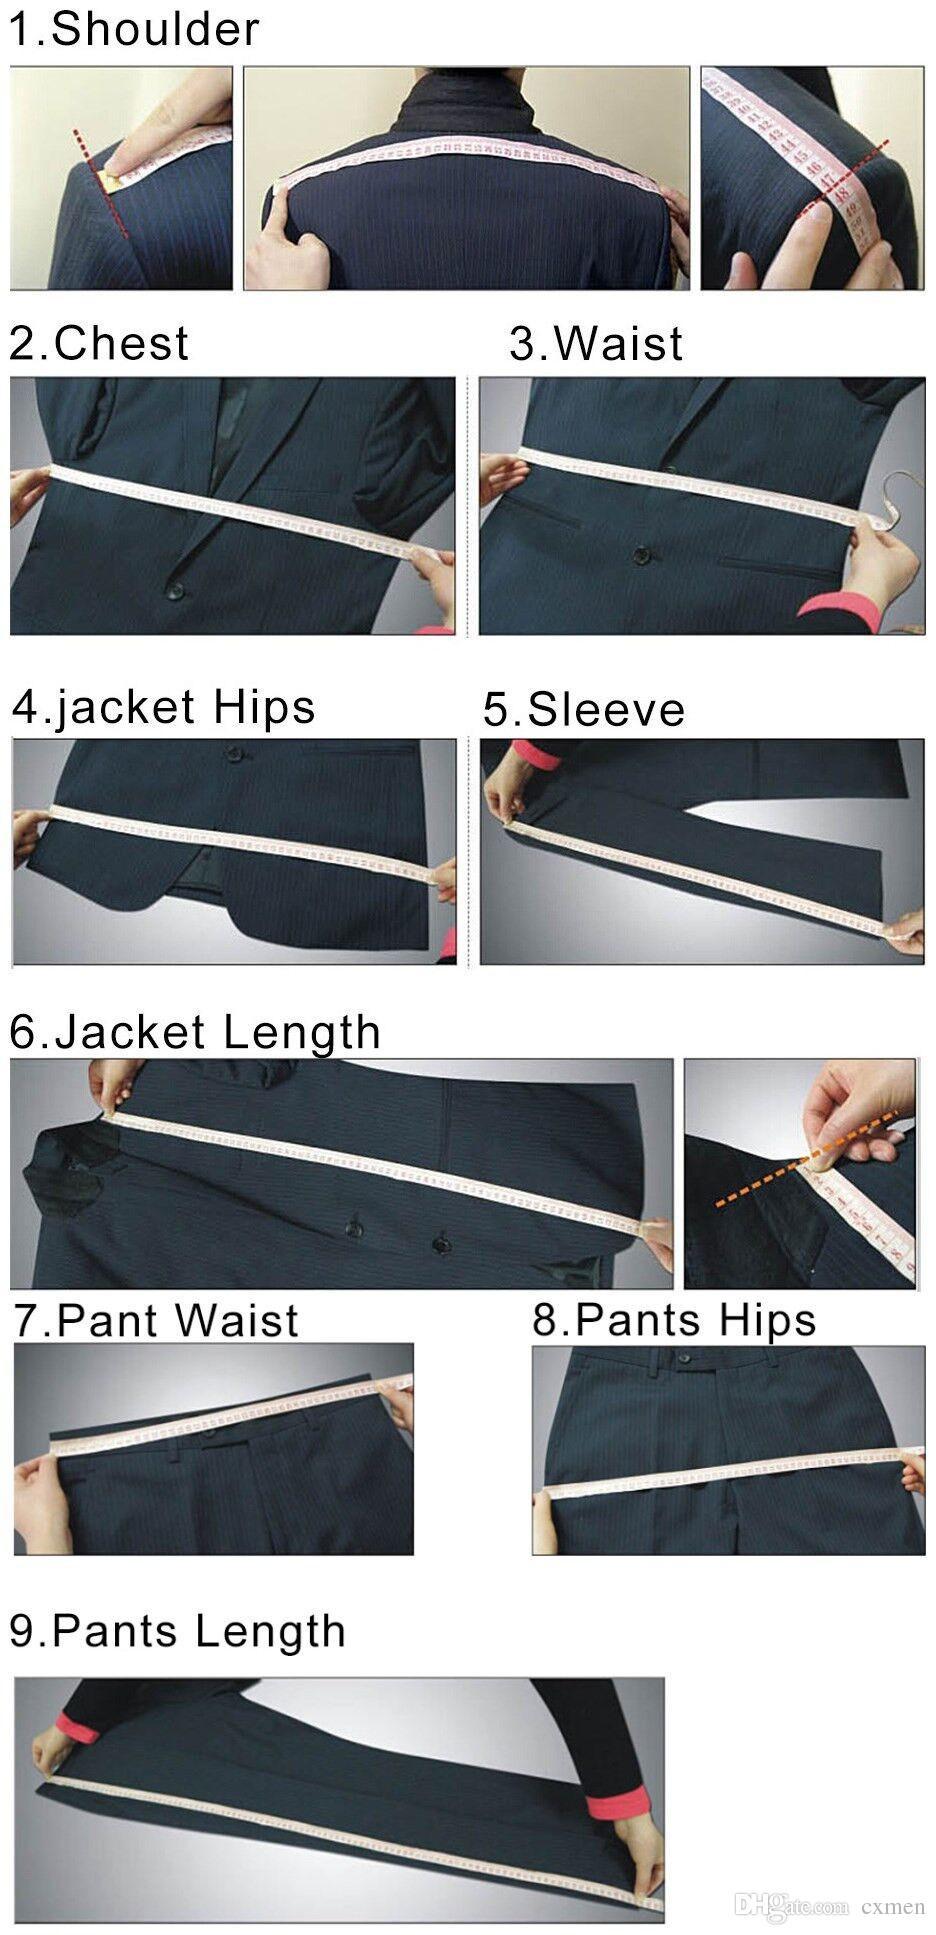 Black Men Suits for Wedding 2018 Satin Shawl Lapel Slim Fit Groom Tuxedos Vintage Men Blazers Jacket+Pants+Vest Groomsmen Suit